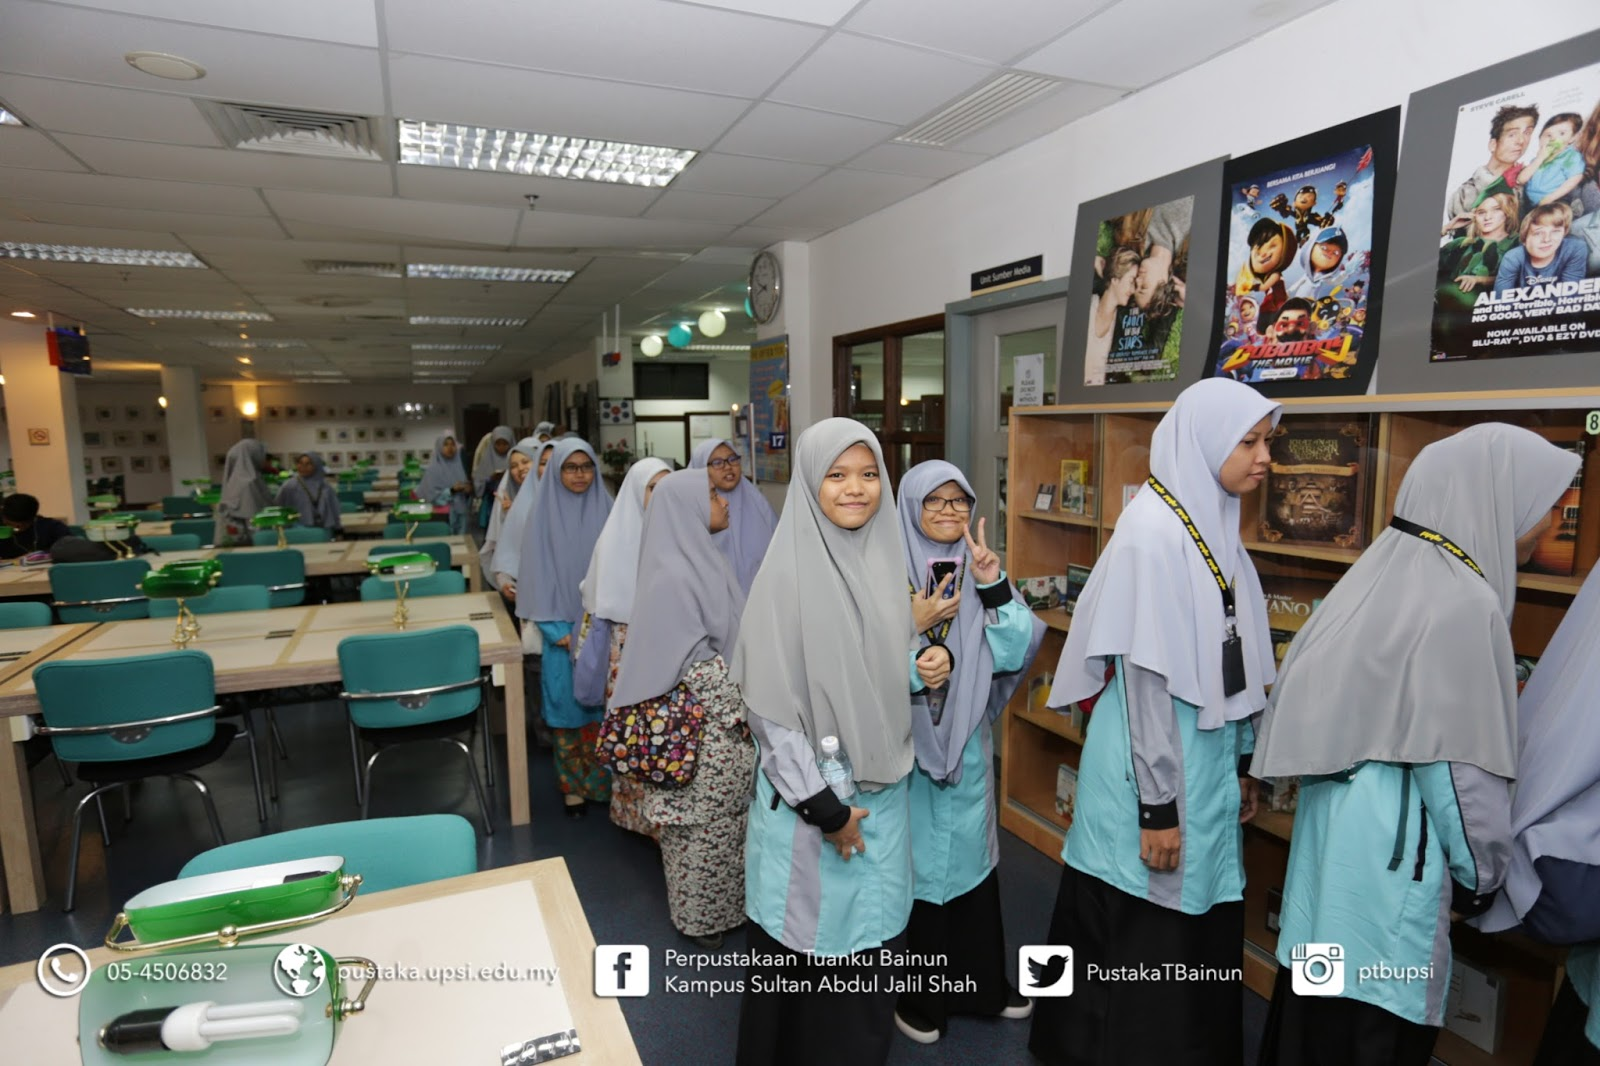 Lawatan Sekolah Agama Menengah Tinggi Sultan Hisamuddin Klang Selangor Upsi Perpustakaan Tuanku Bainun